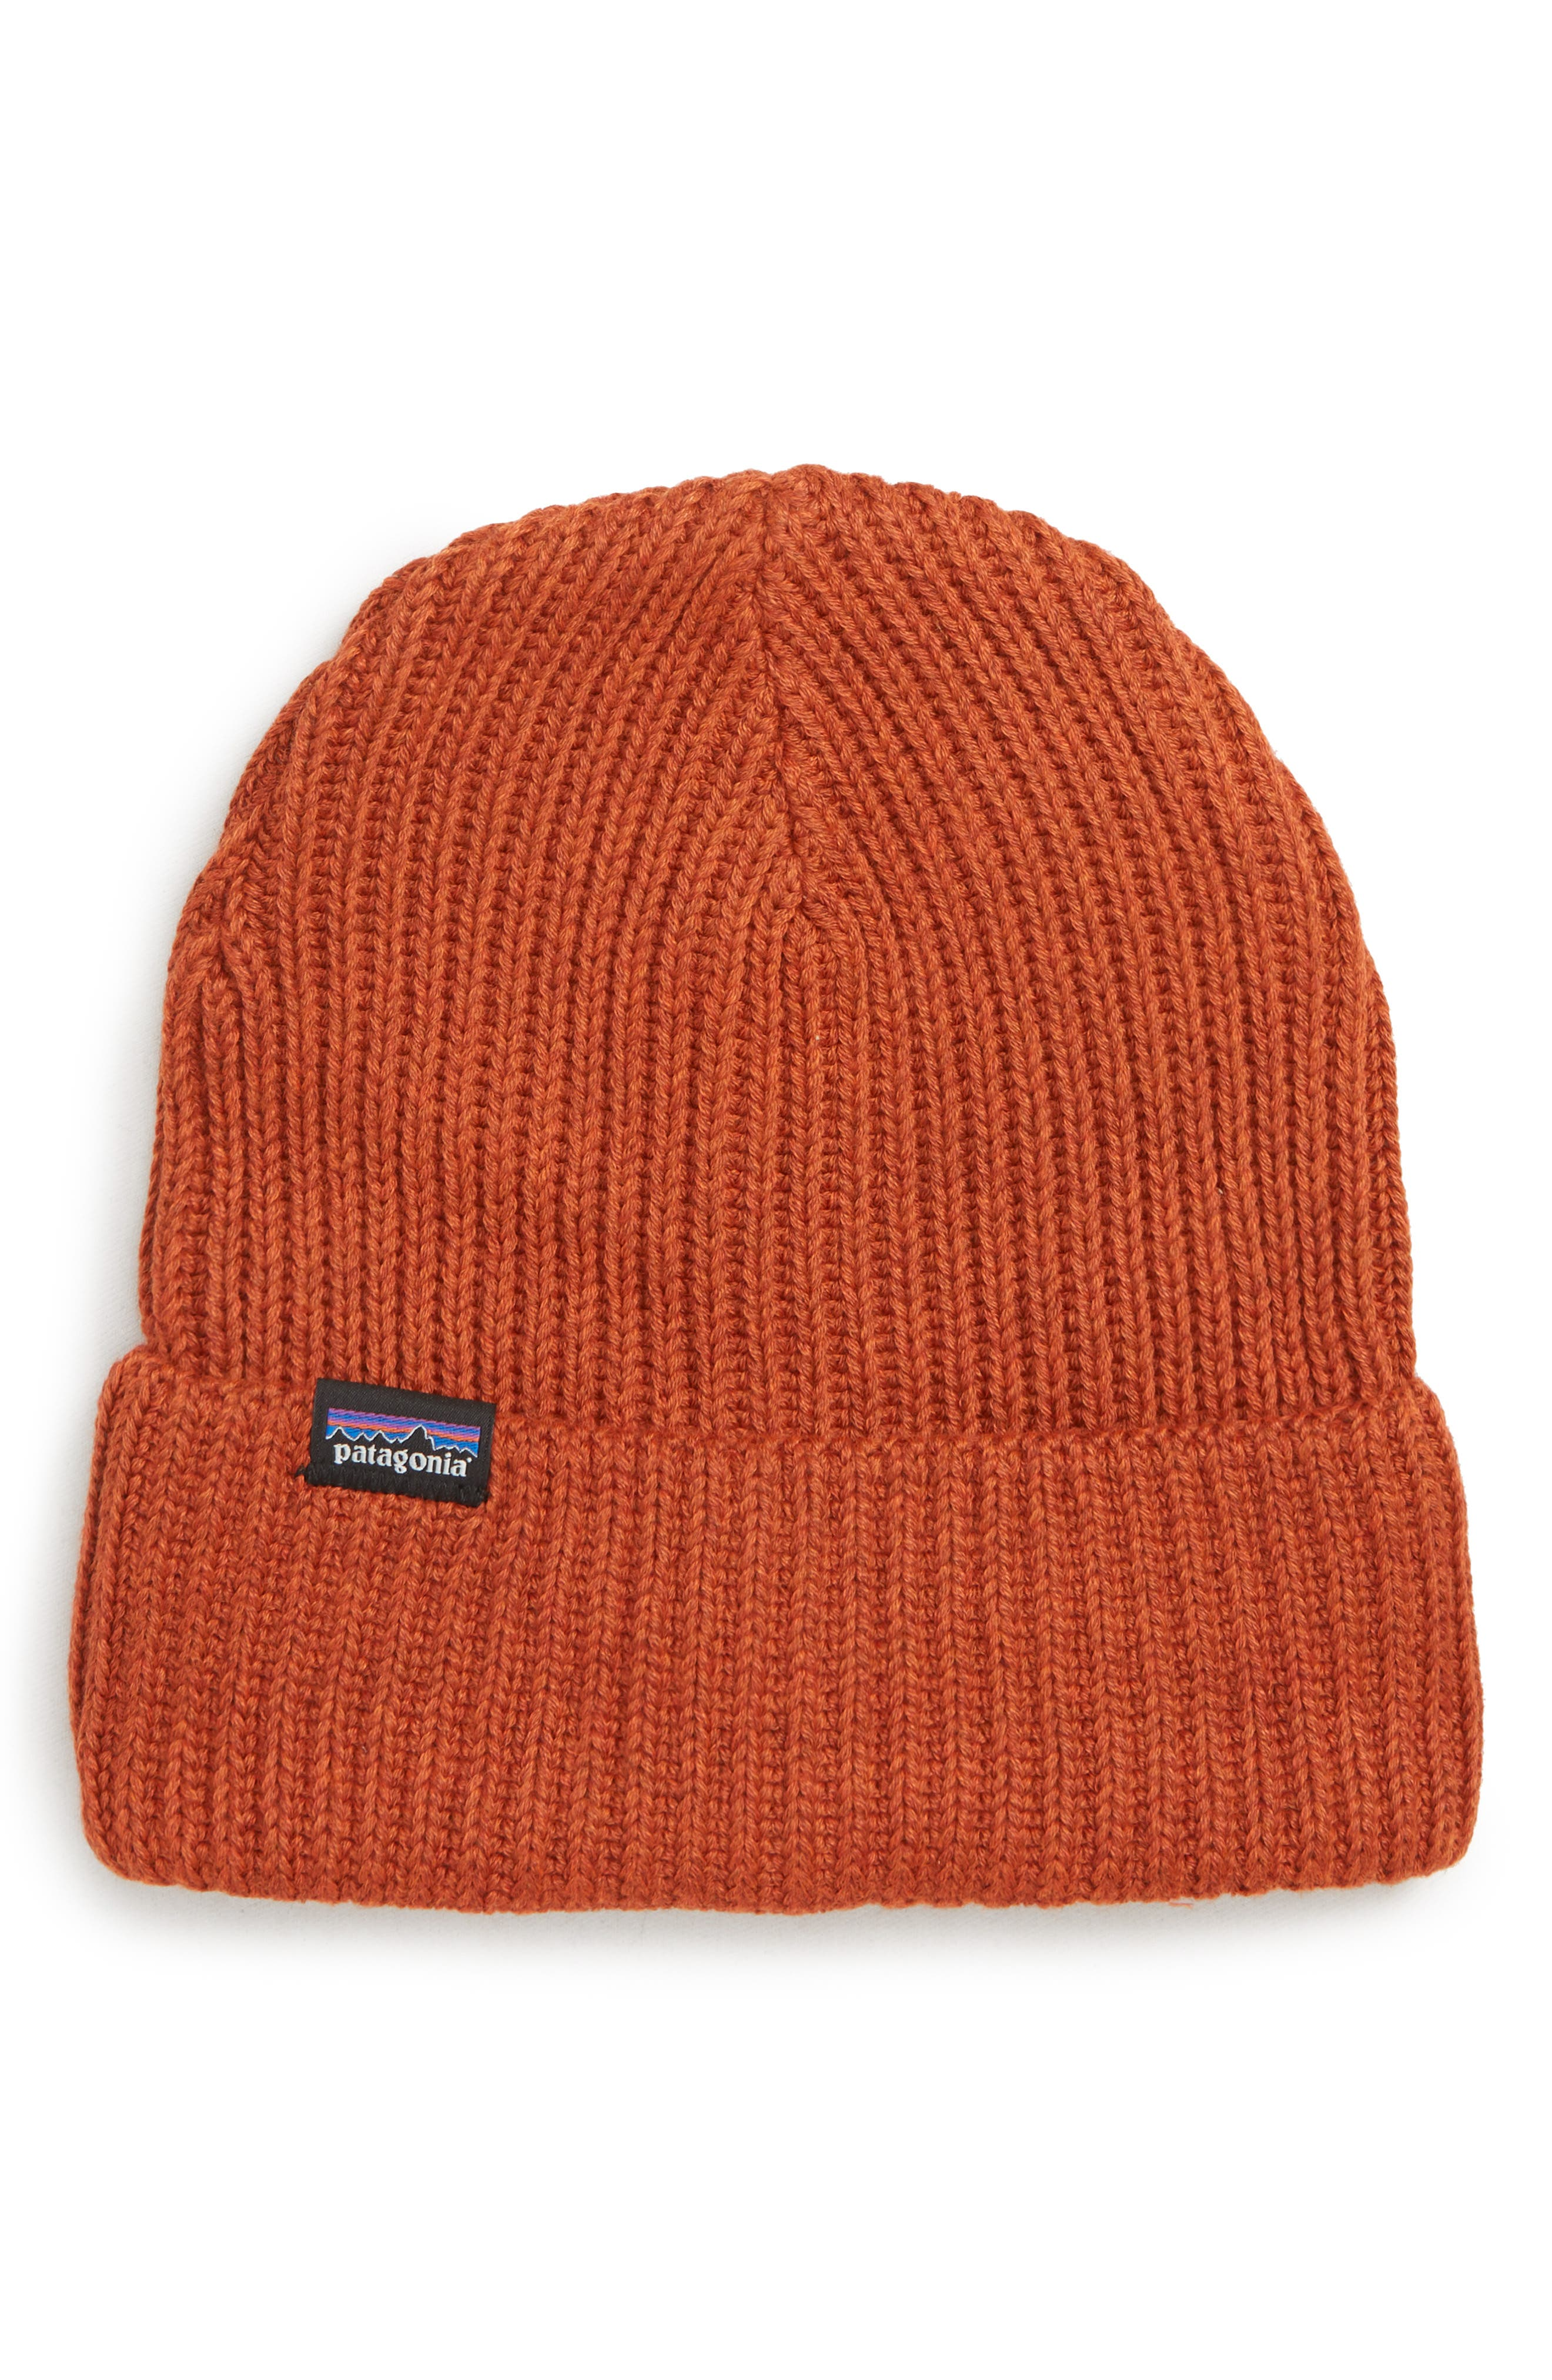 7d3b726117cd1 ireland mens fox hunting hat knitting 2387d 340e8